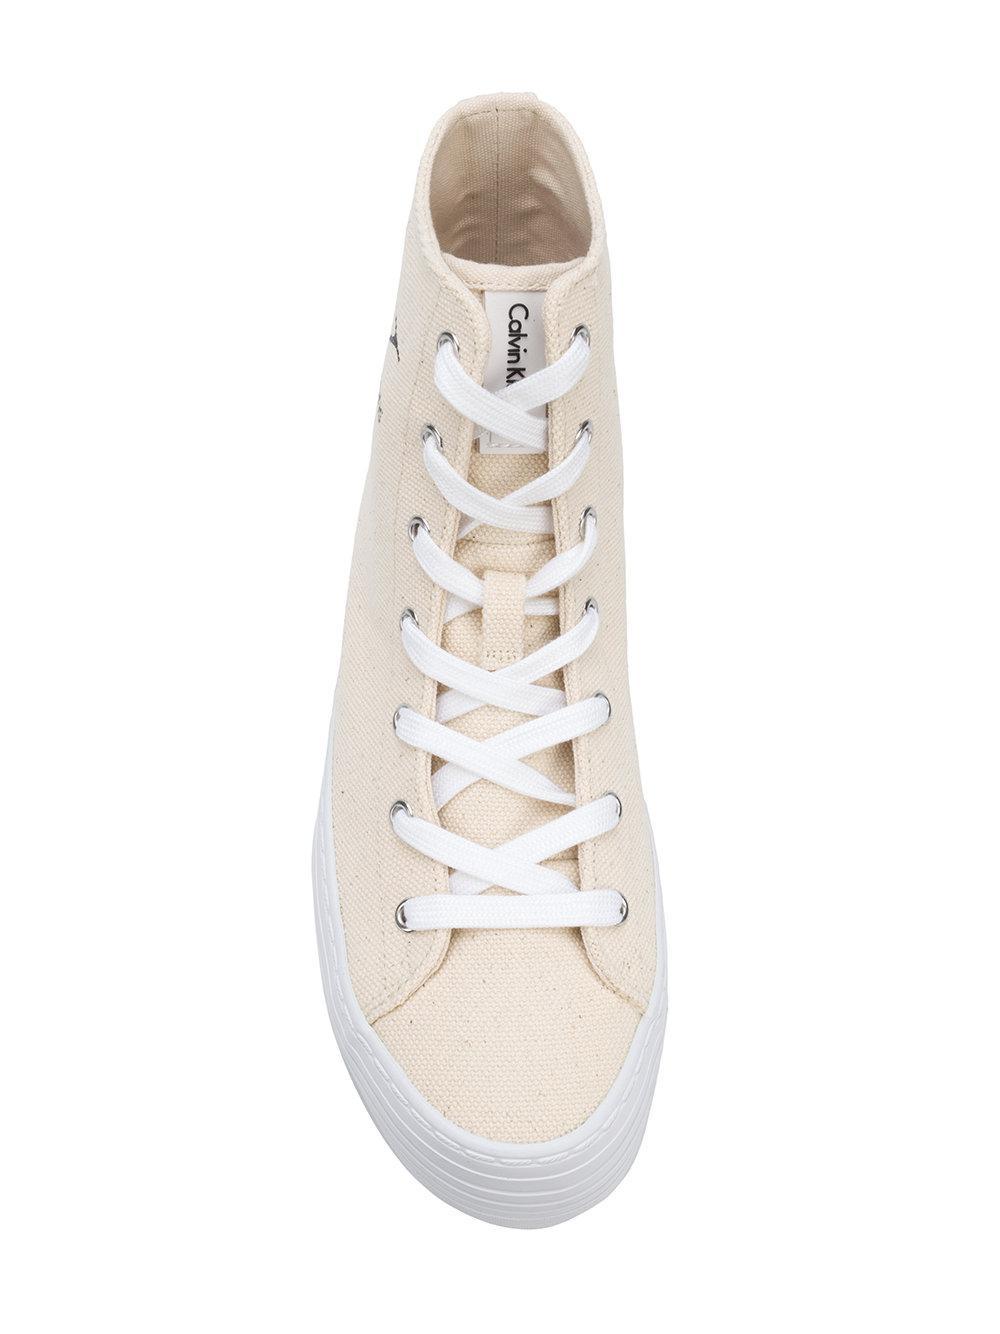 flatform hi-top sneakers - Nude & Neutrals Calvin Klein Jeans fOe6xz